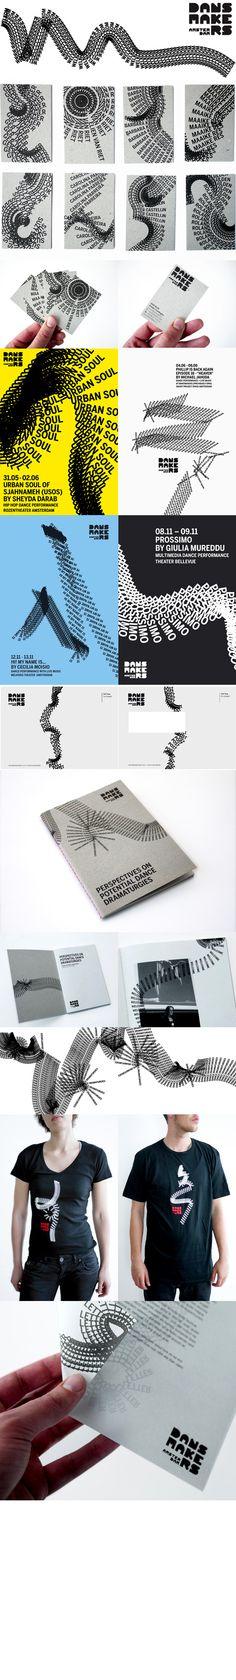 Dansmakers   Lava Graphic Design, Amsterdam